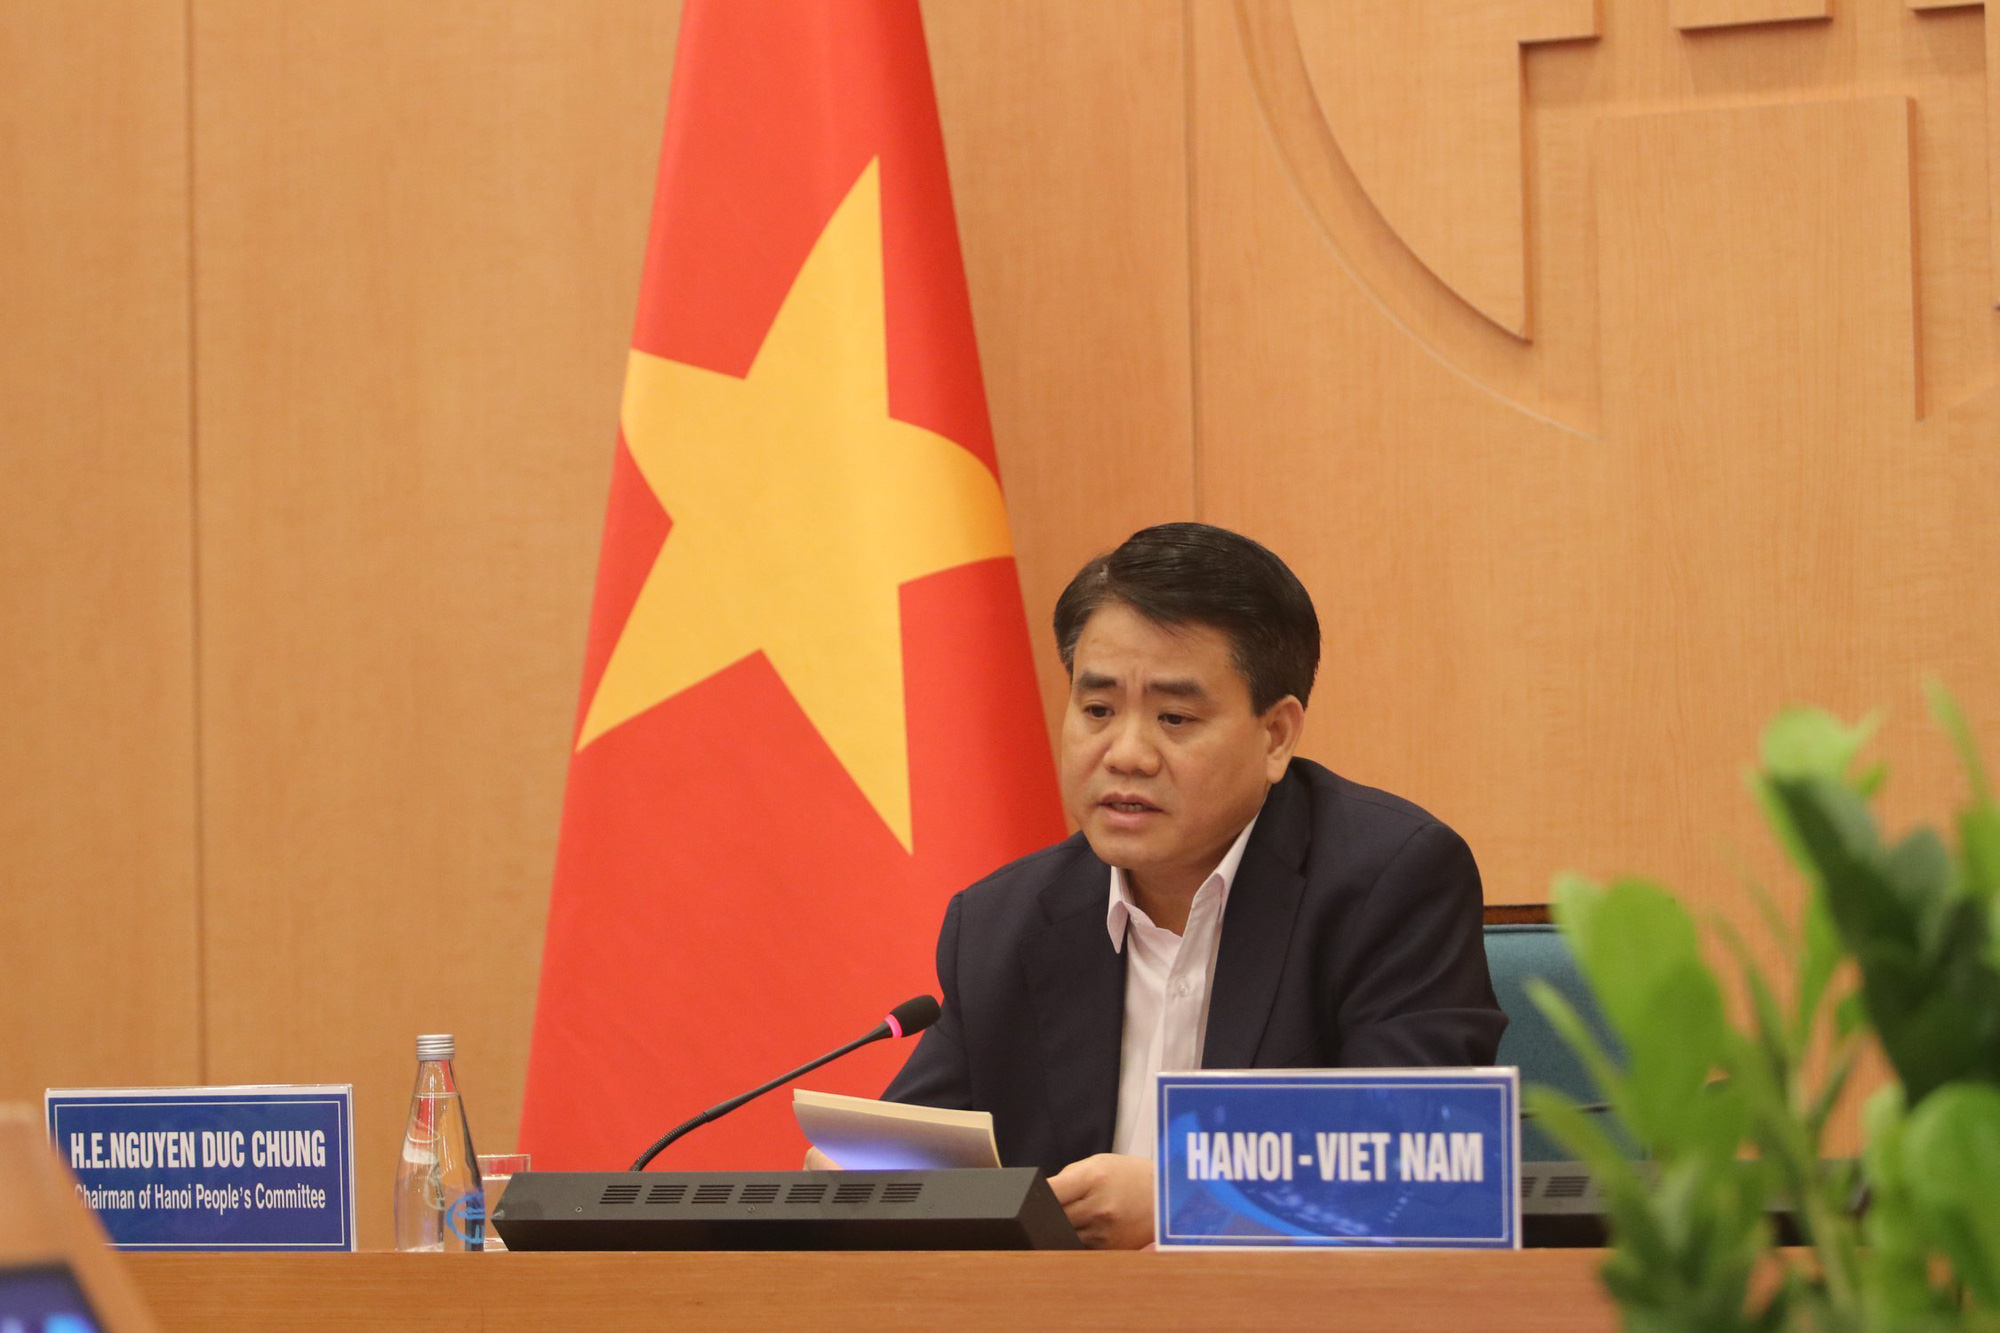 Vietnam sacrifices economic benefits to protect people from COVID-19: Hanoi chairman